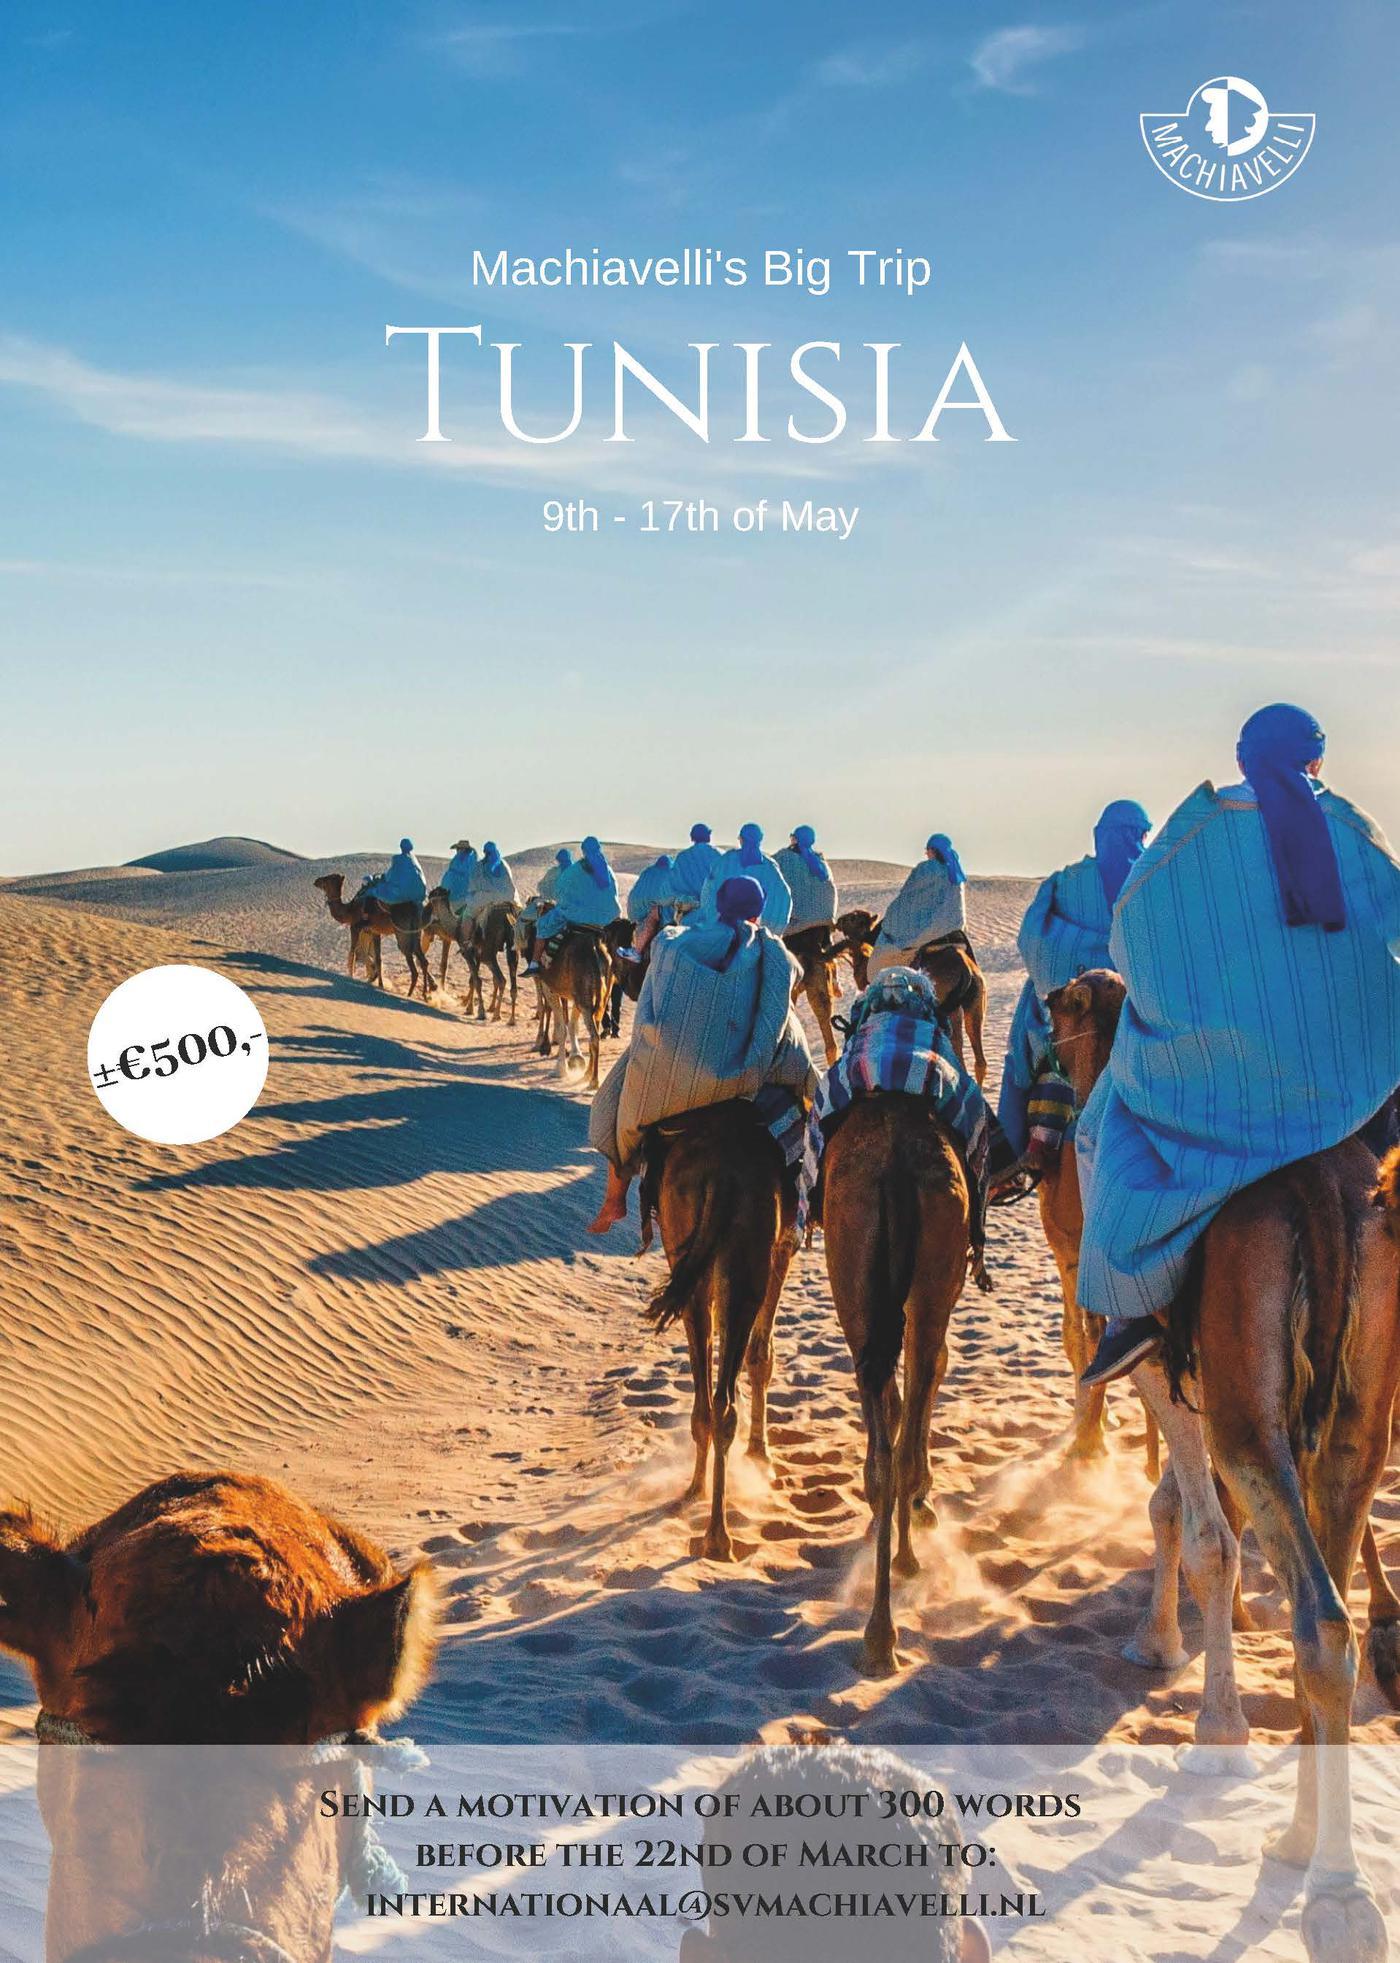 Machiavelli's Big Trip: Tunesia